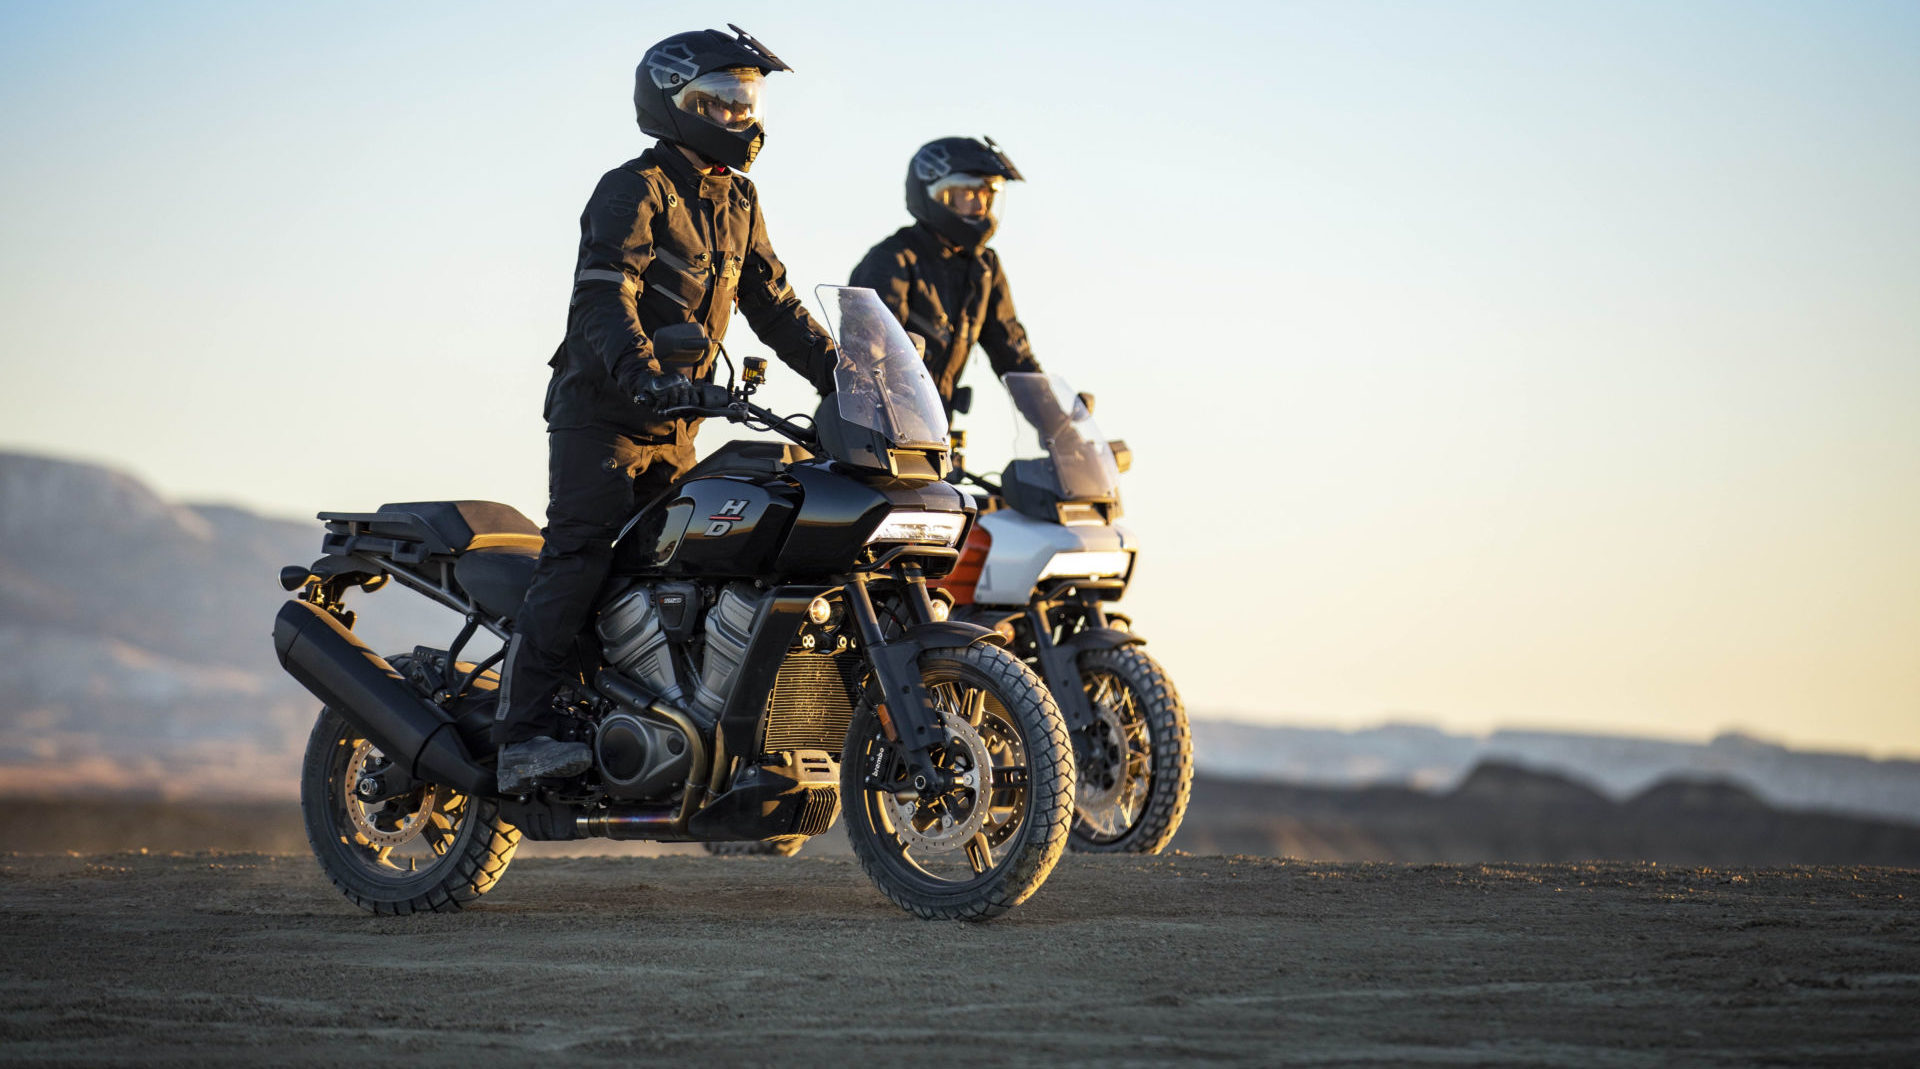 Harley-Davidson's new Pan America 1250 adventure touring bike. Photo courtesy Harley-Davidson.